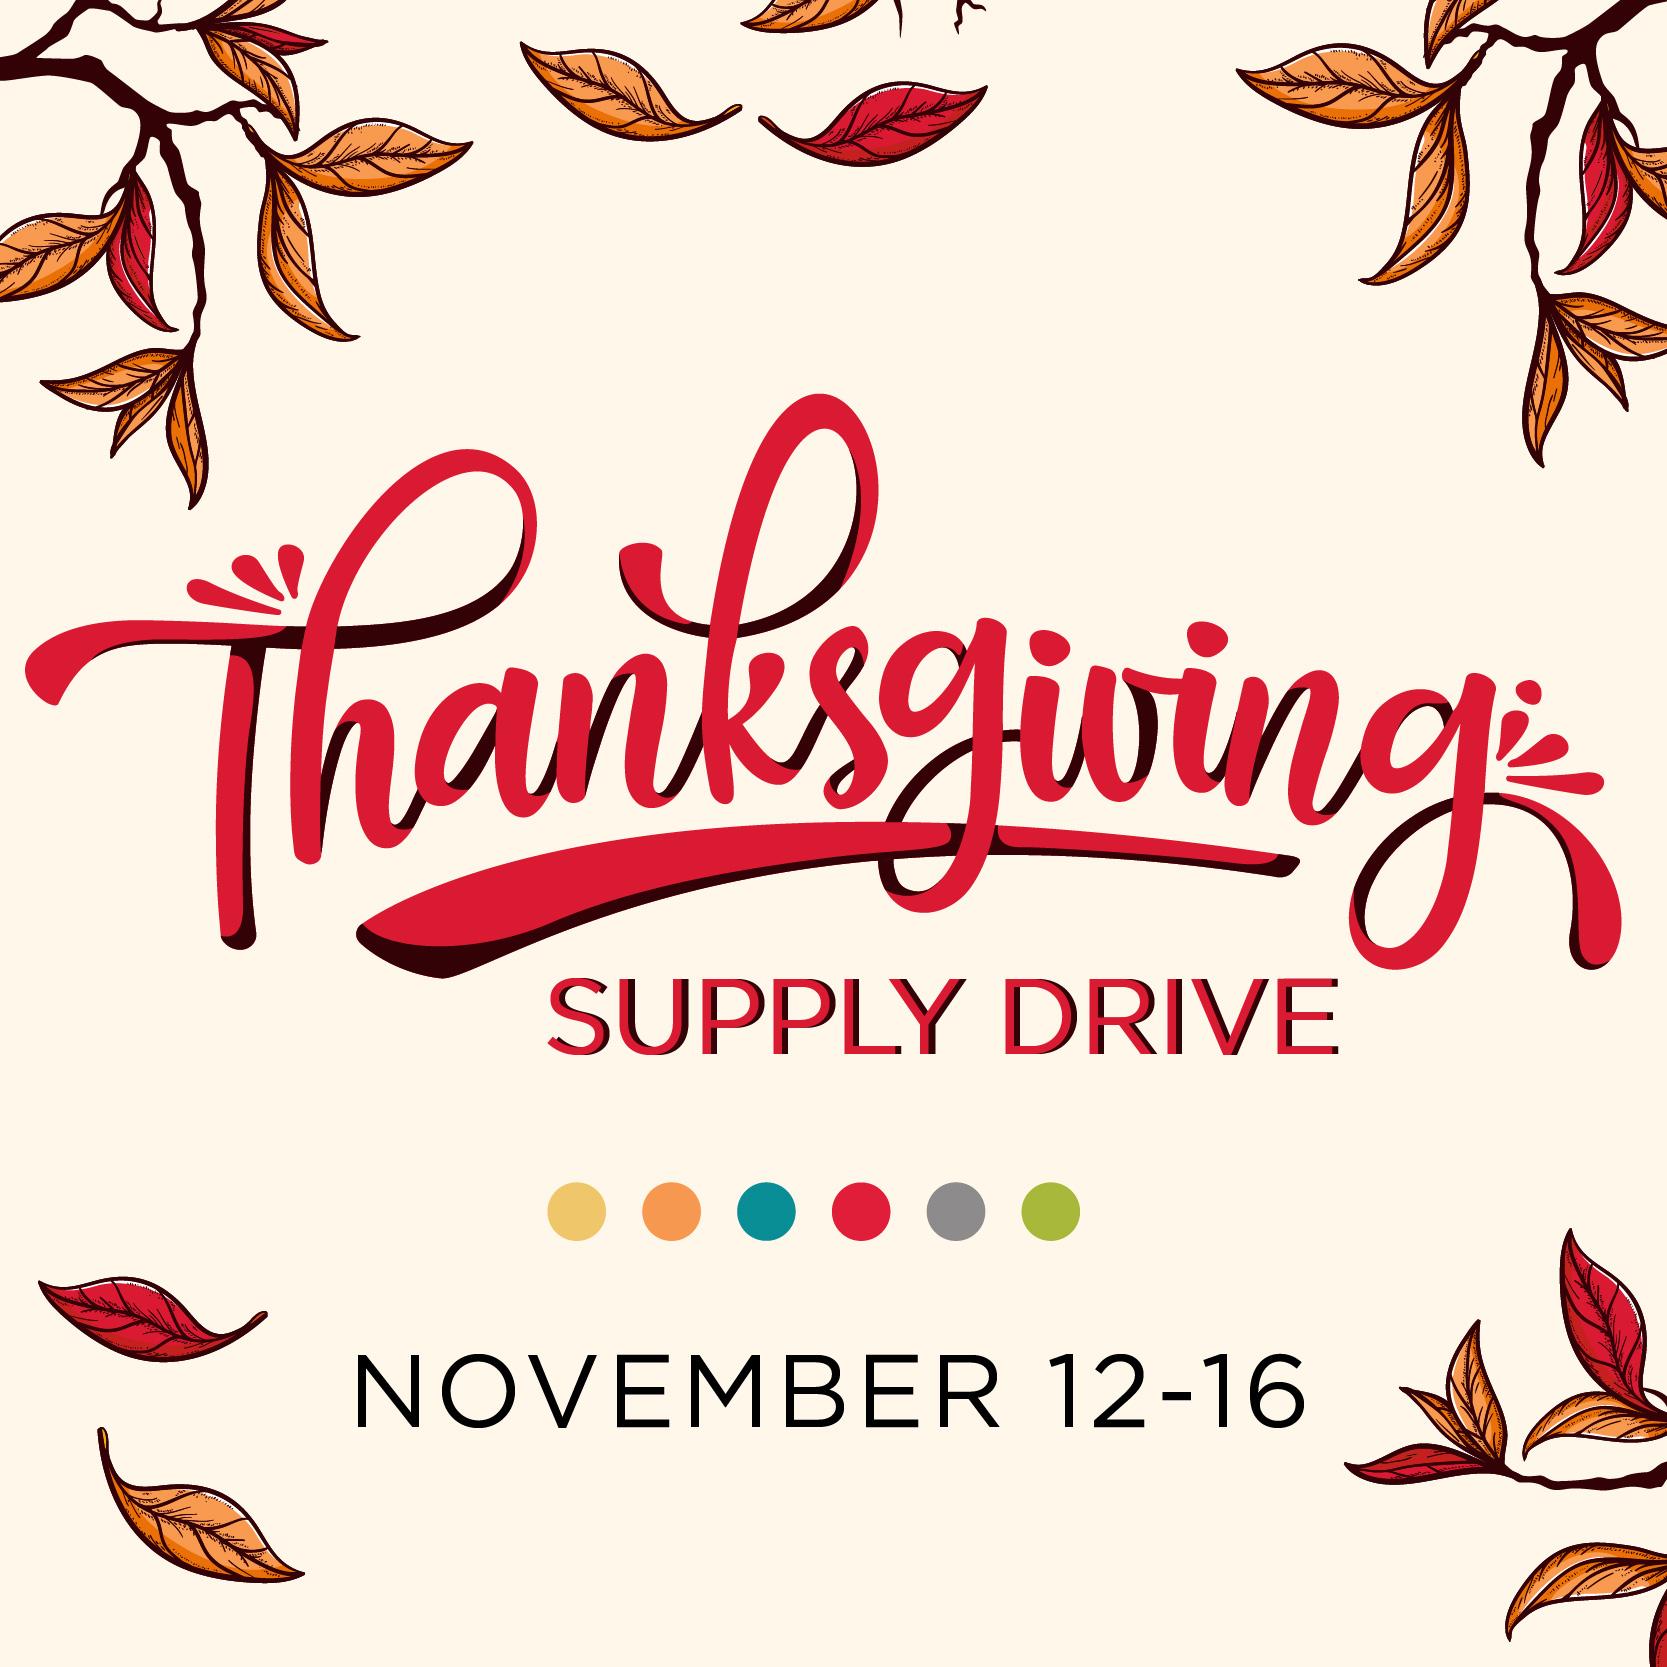 Thanksgiving Supply Drive- November 12-16